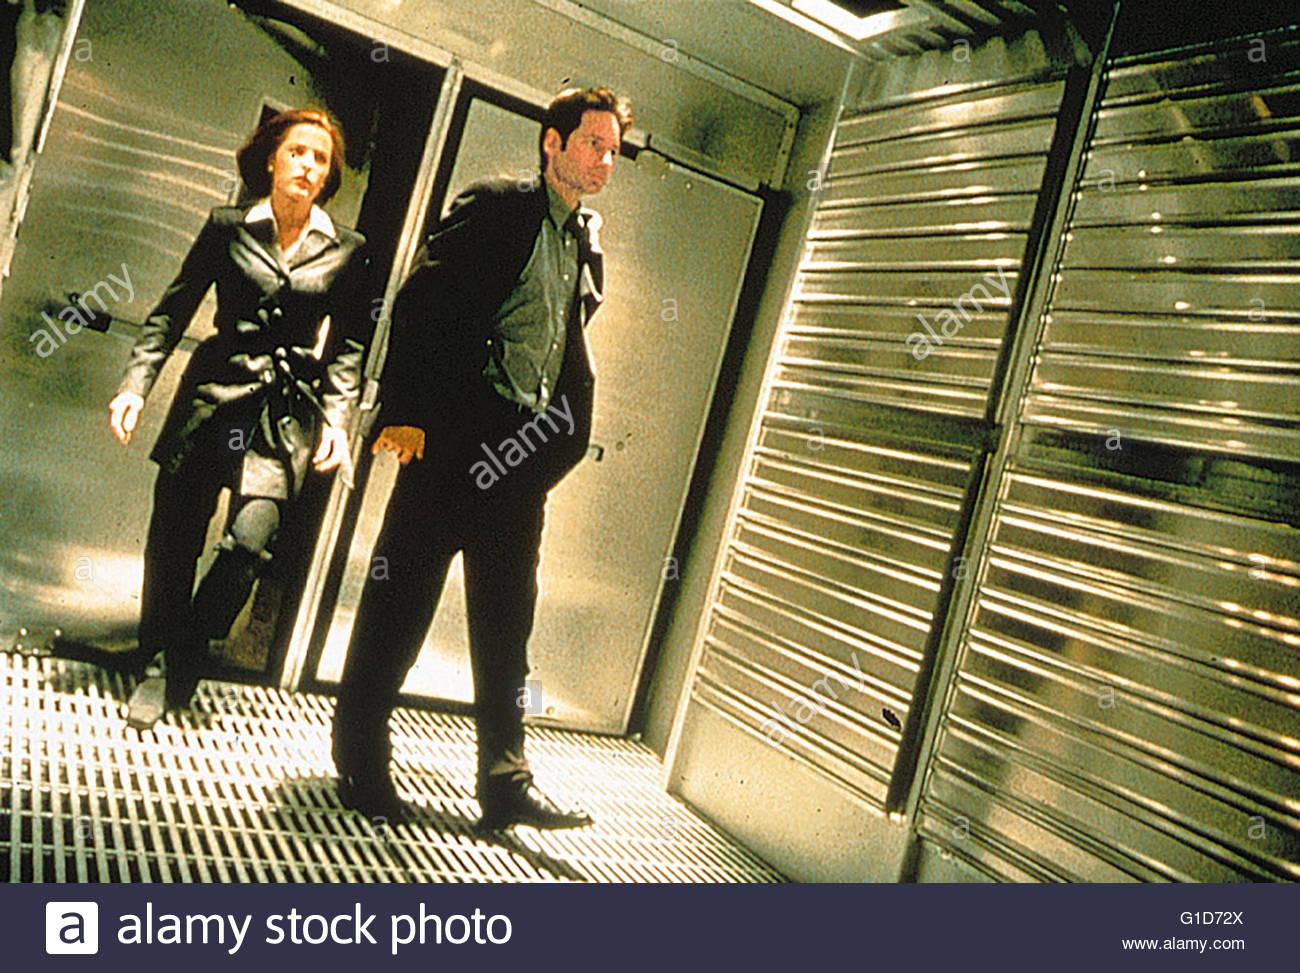 Akte X - Der Film / Gillian Anderson / David Duchovny, - Stock Image